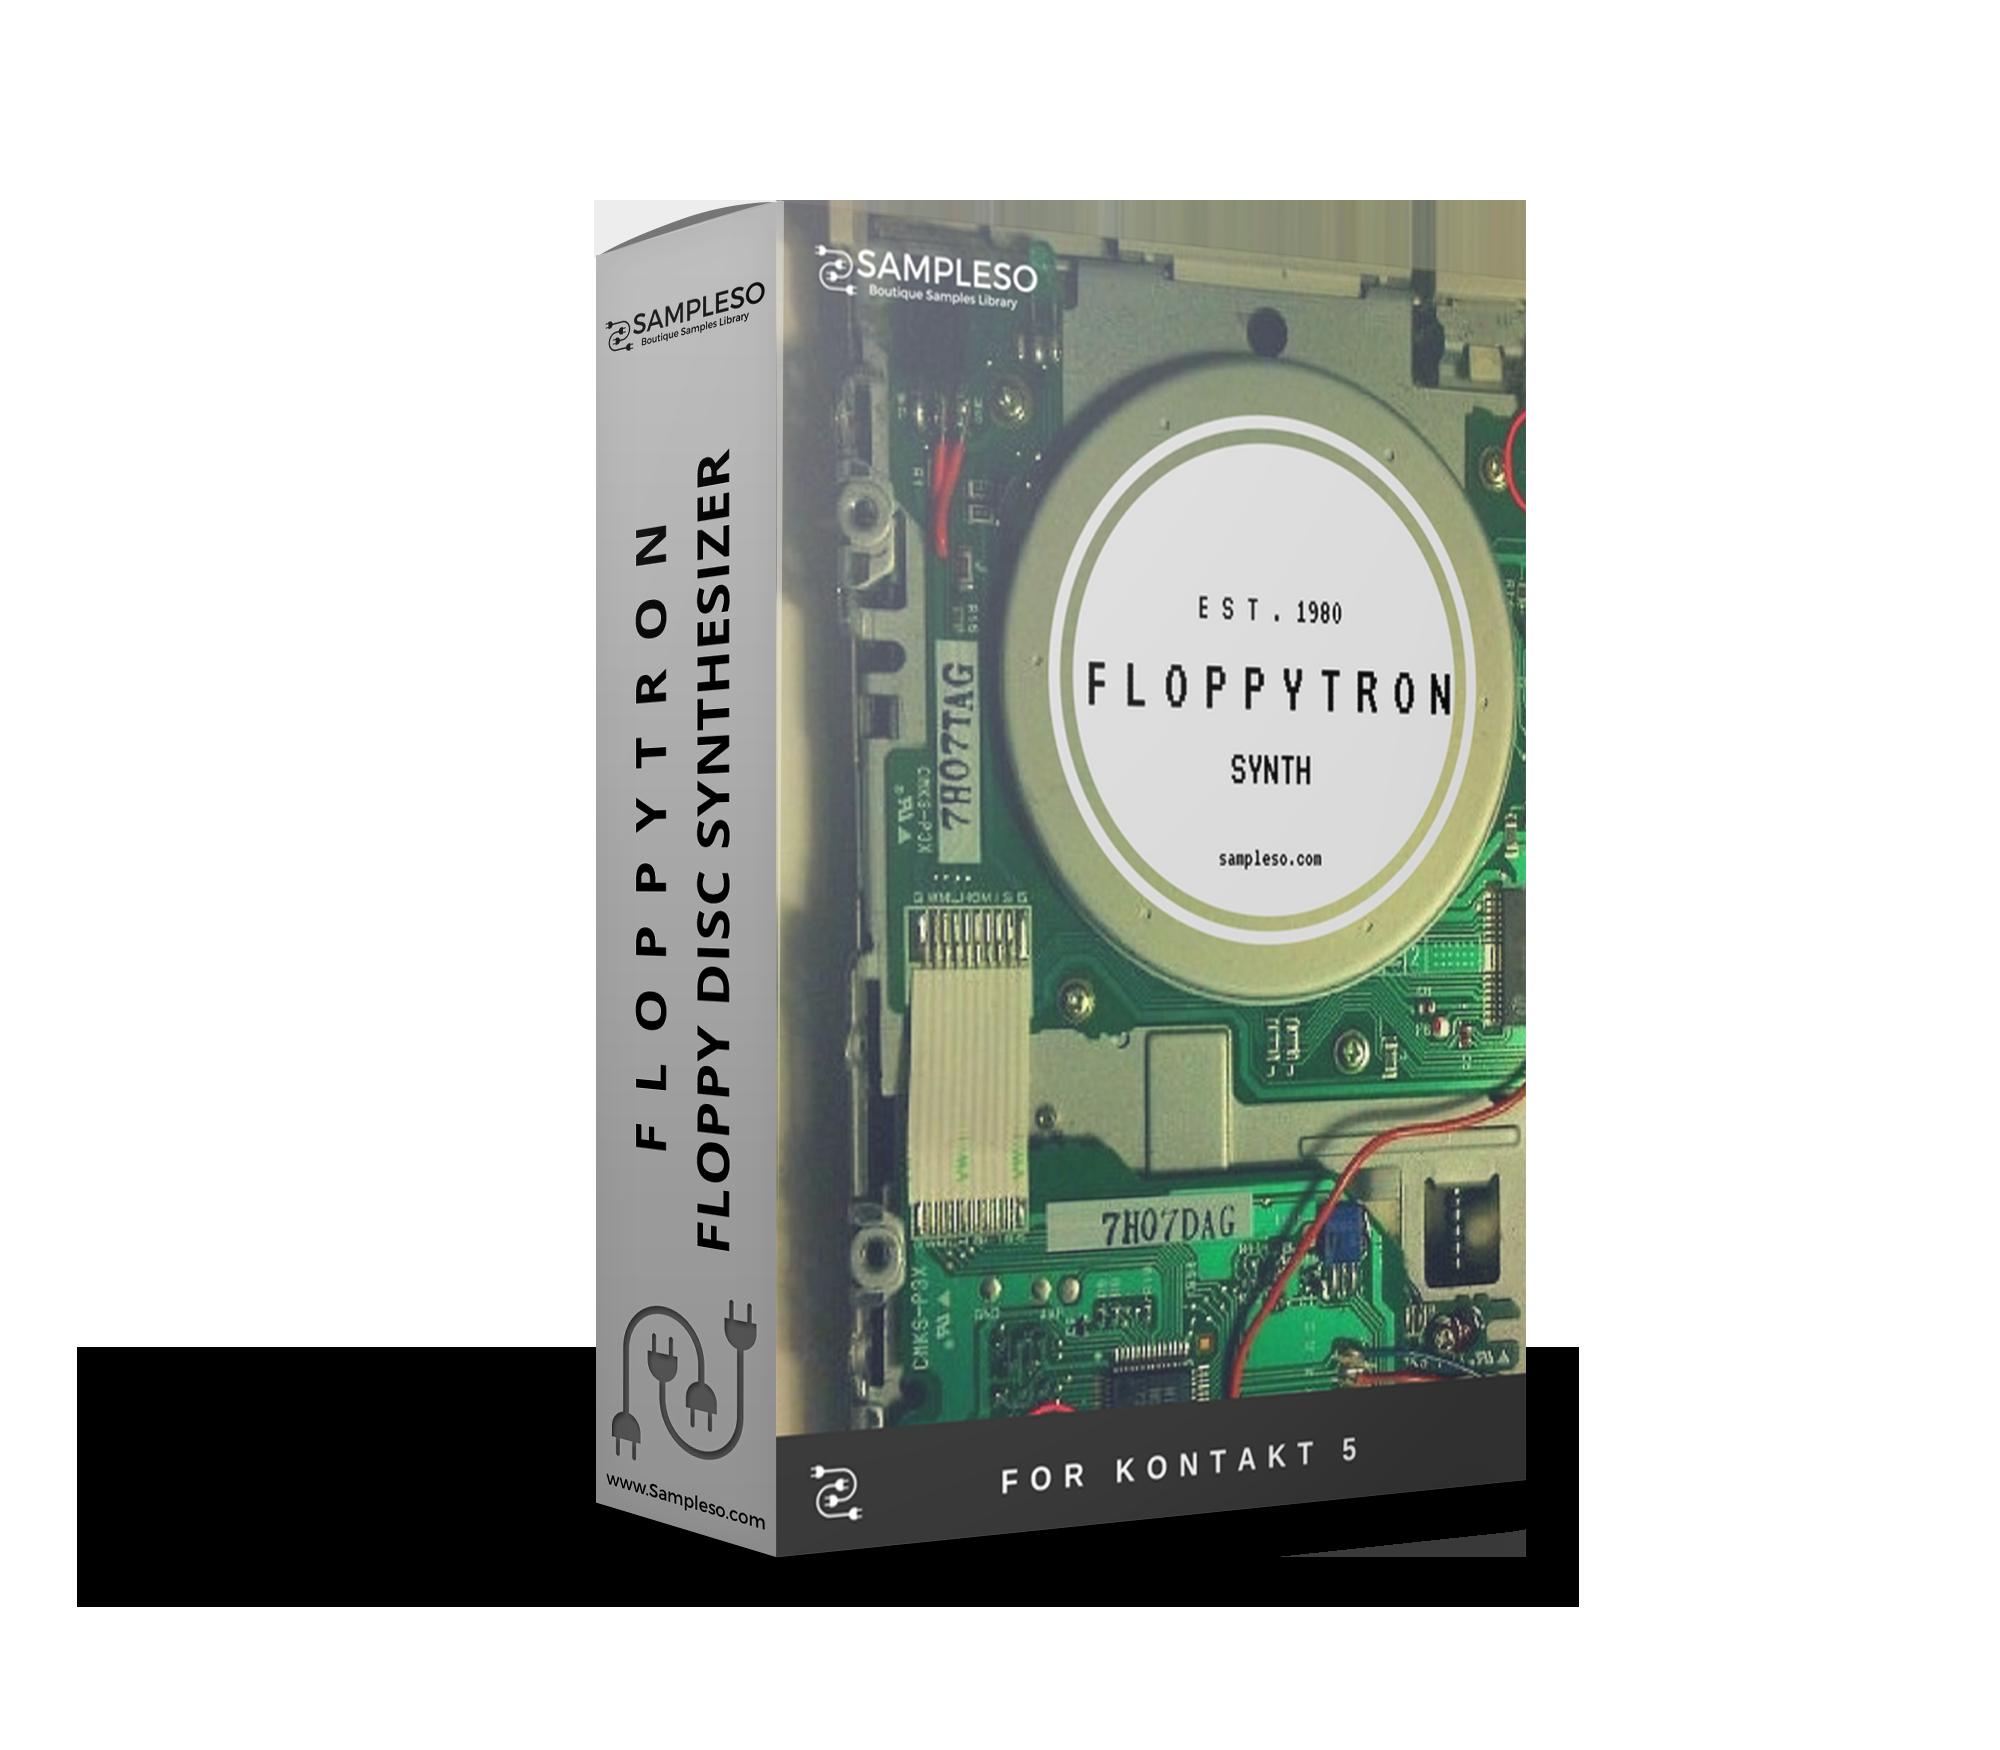 THE FLOPPYTRON SYNTH — Sampleso